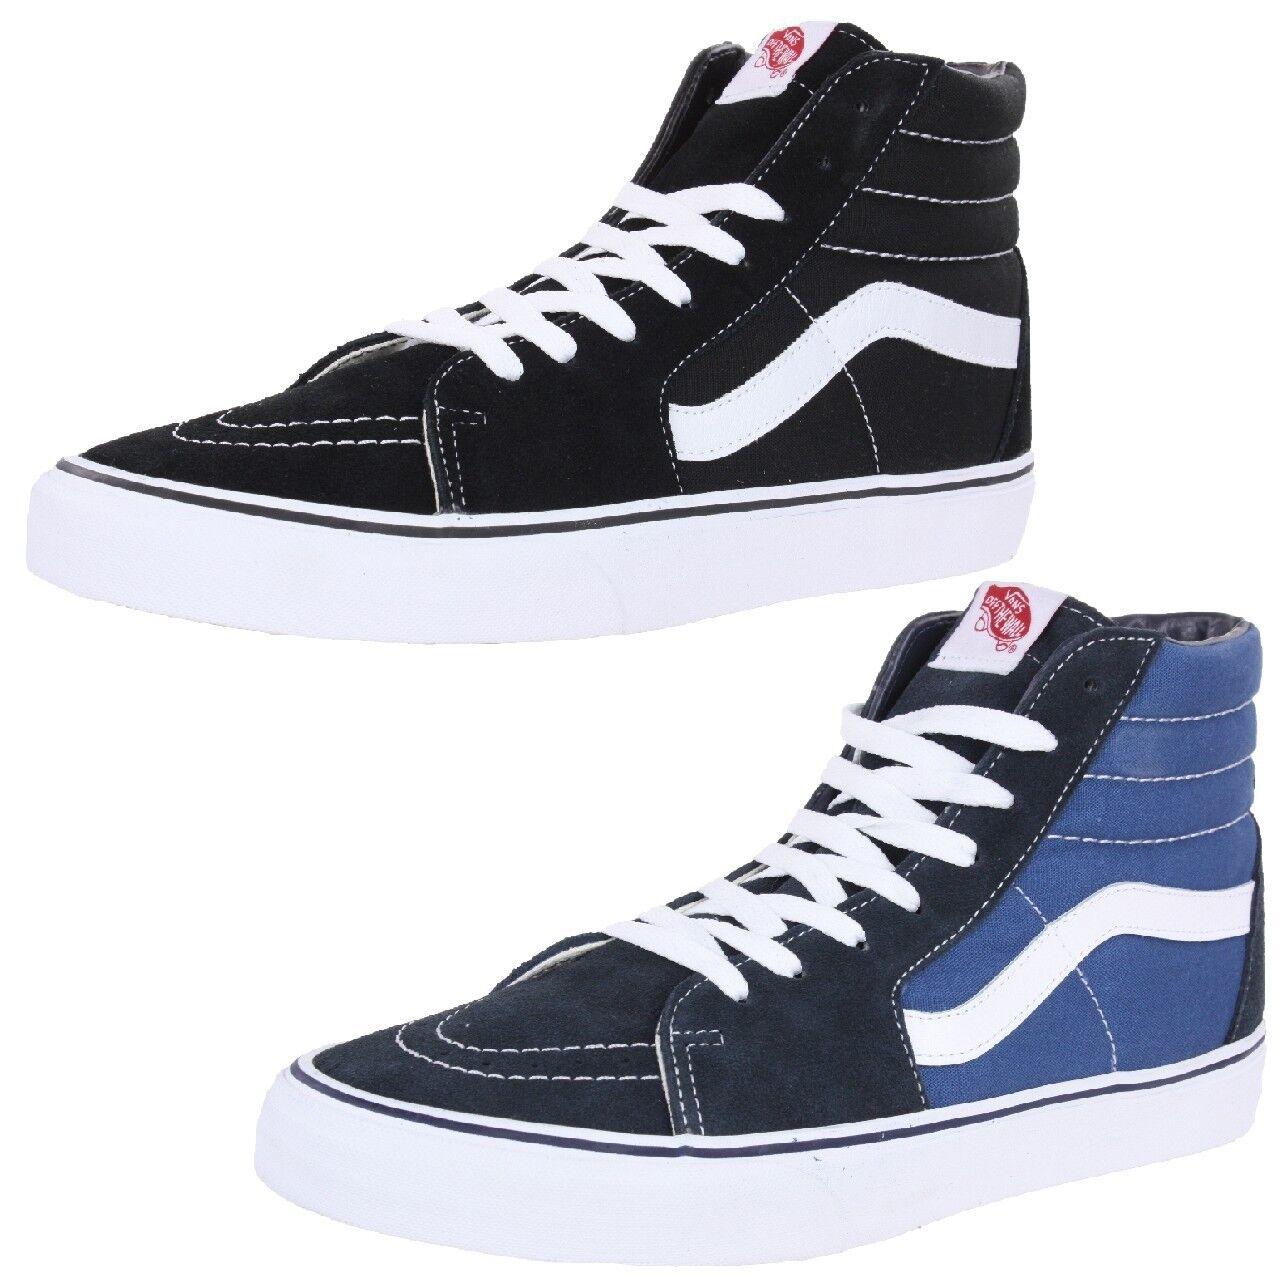 VANS Classic SK8-HI Sneaker Skate Schuhe Klassiker